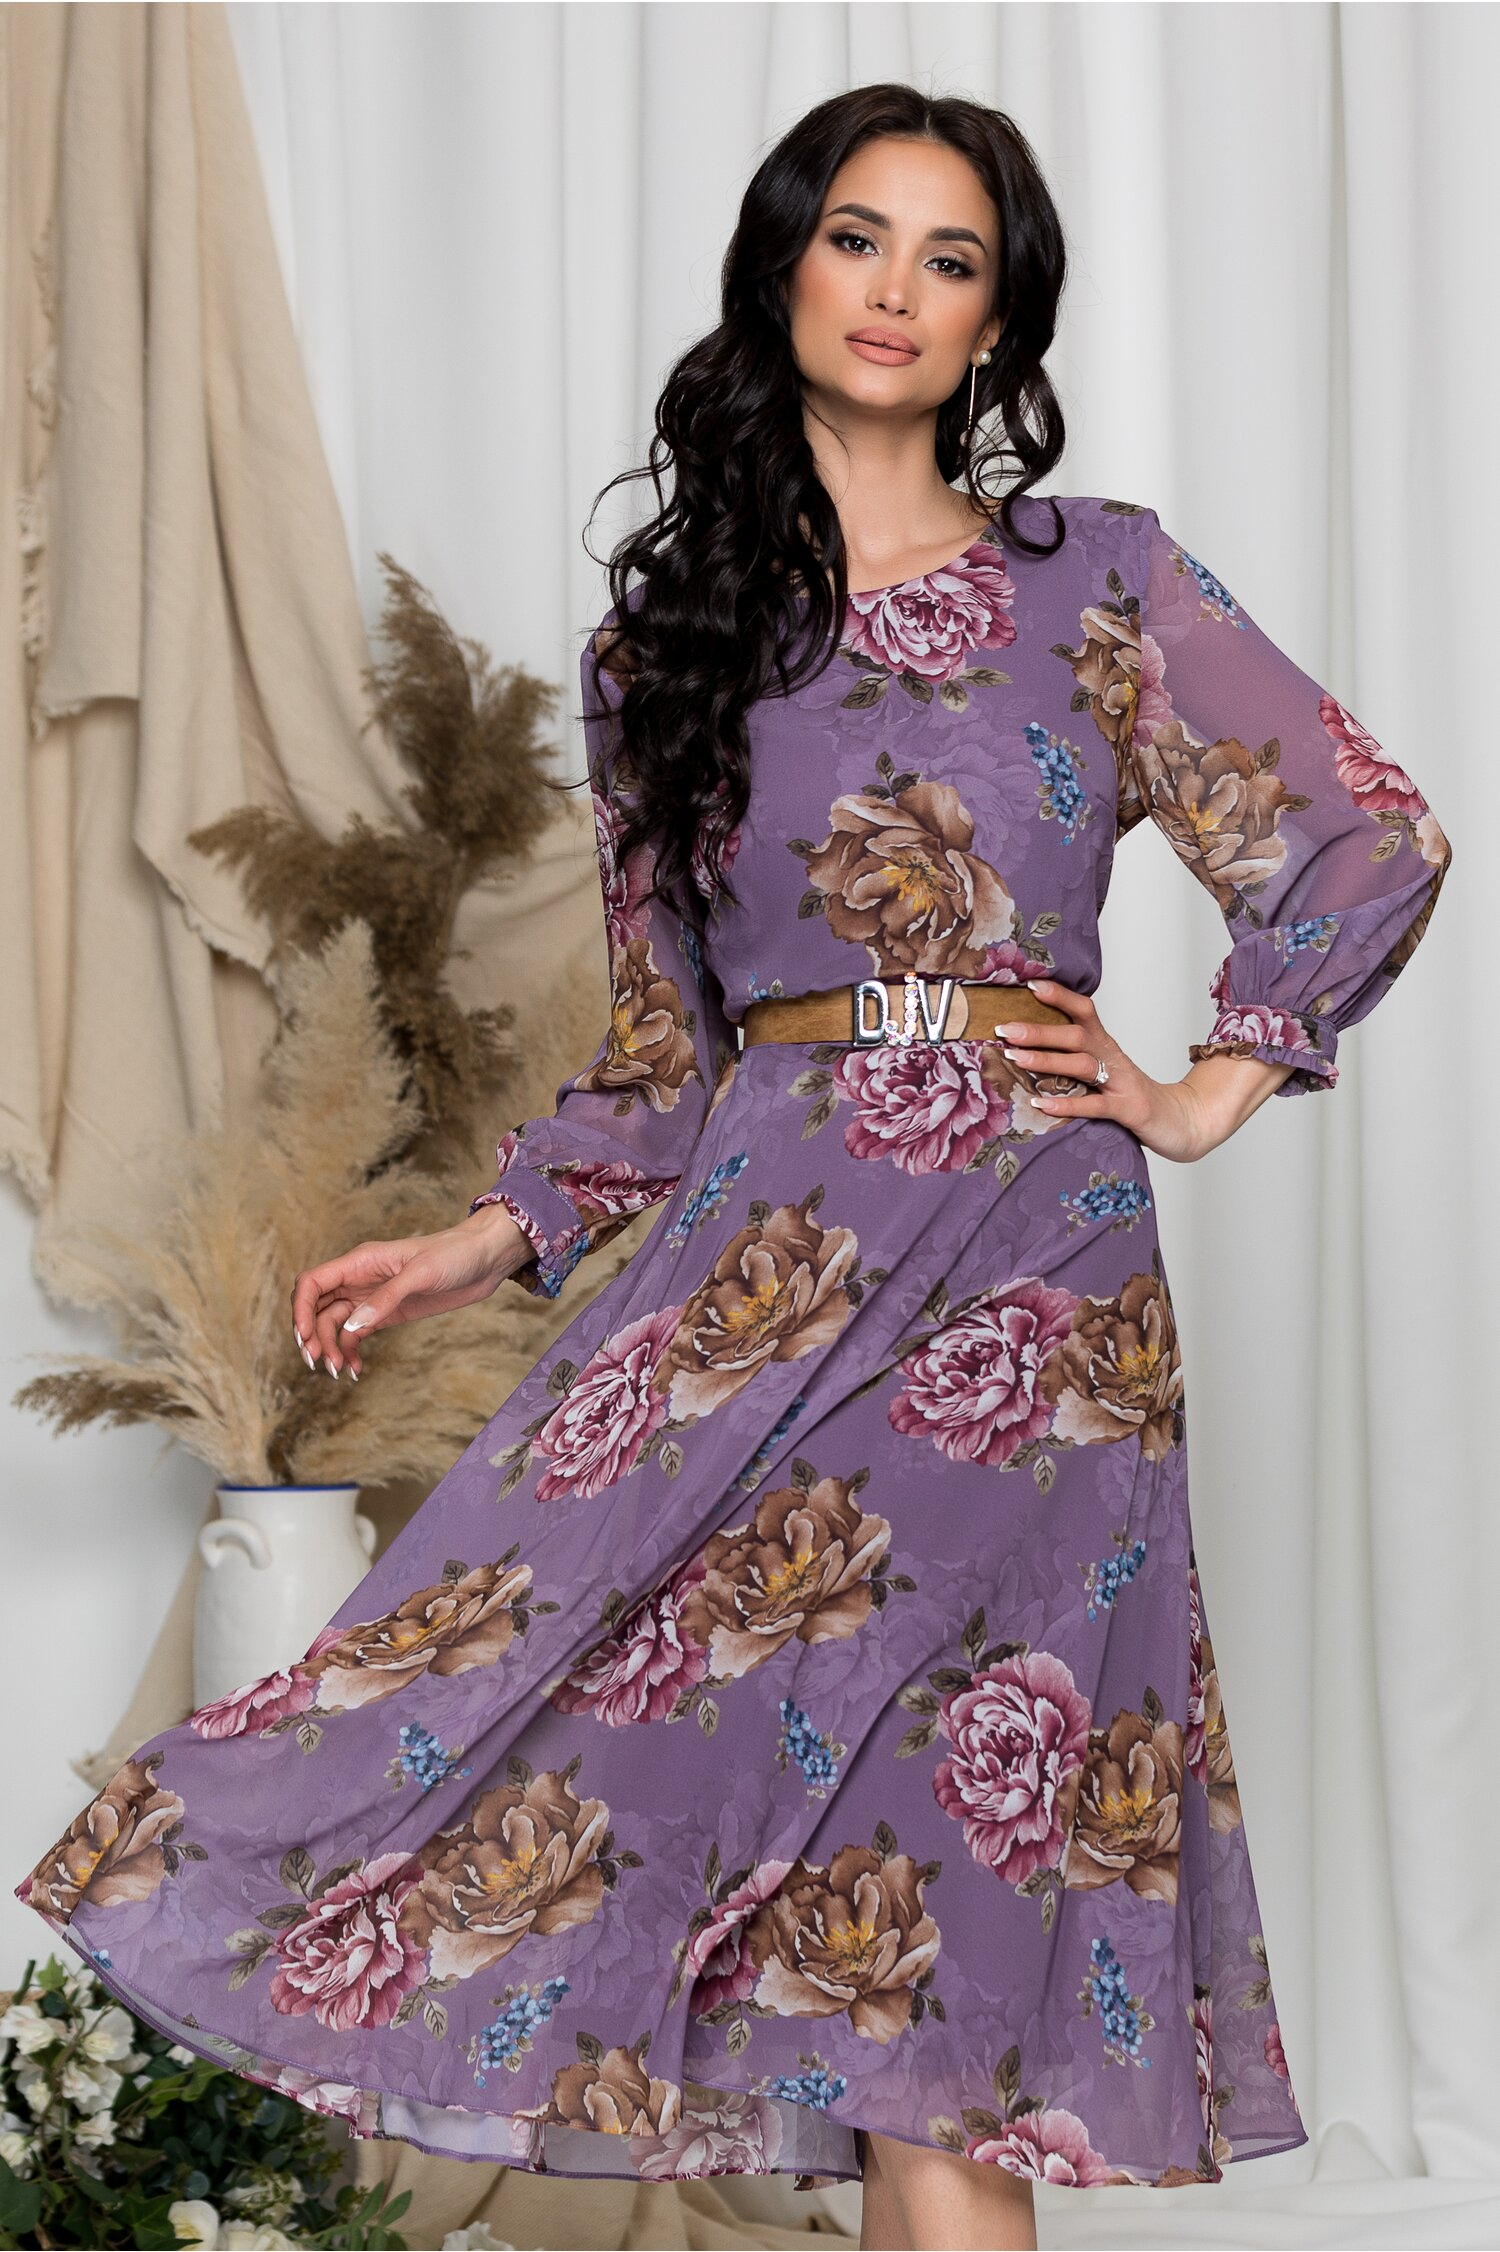 Rochie Vera lila cu imprimeuri florale maro